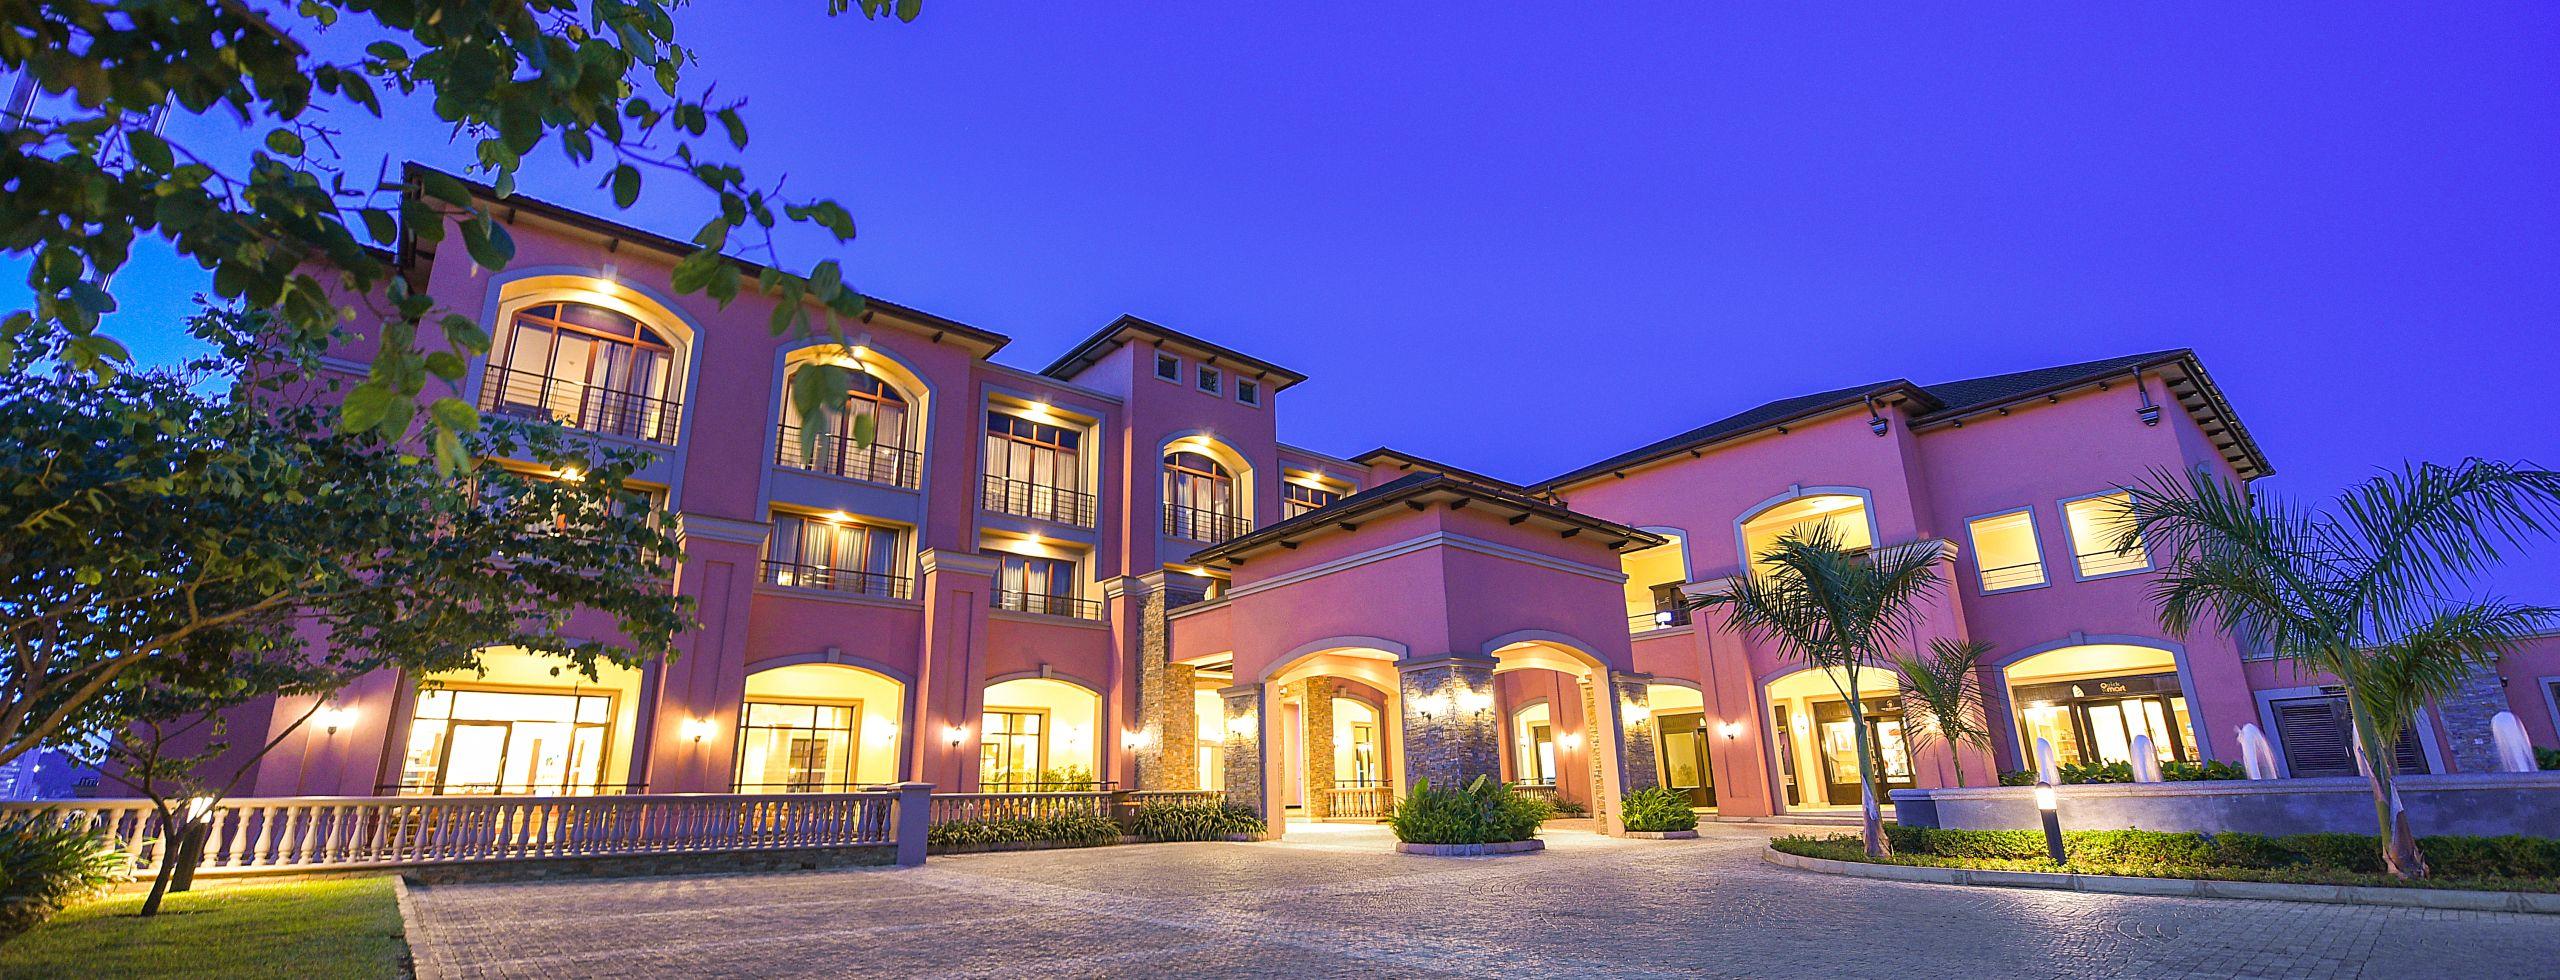 Homepage: Night shot of exterior